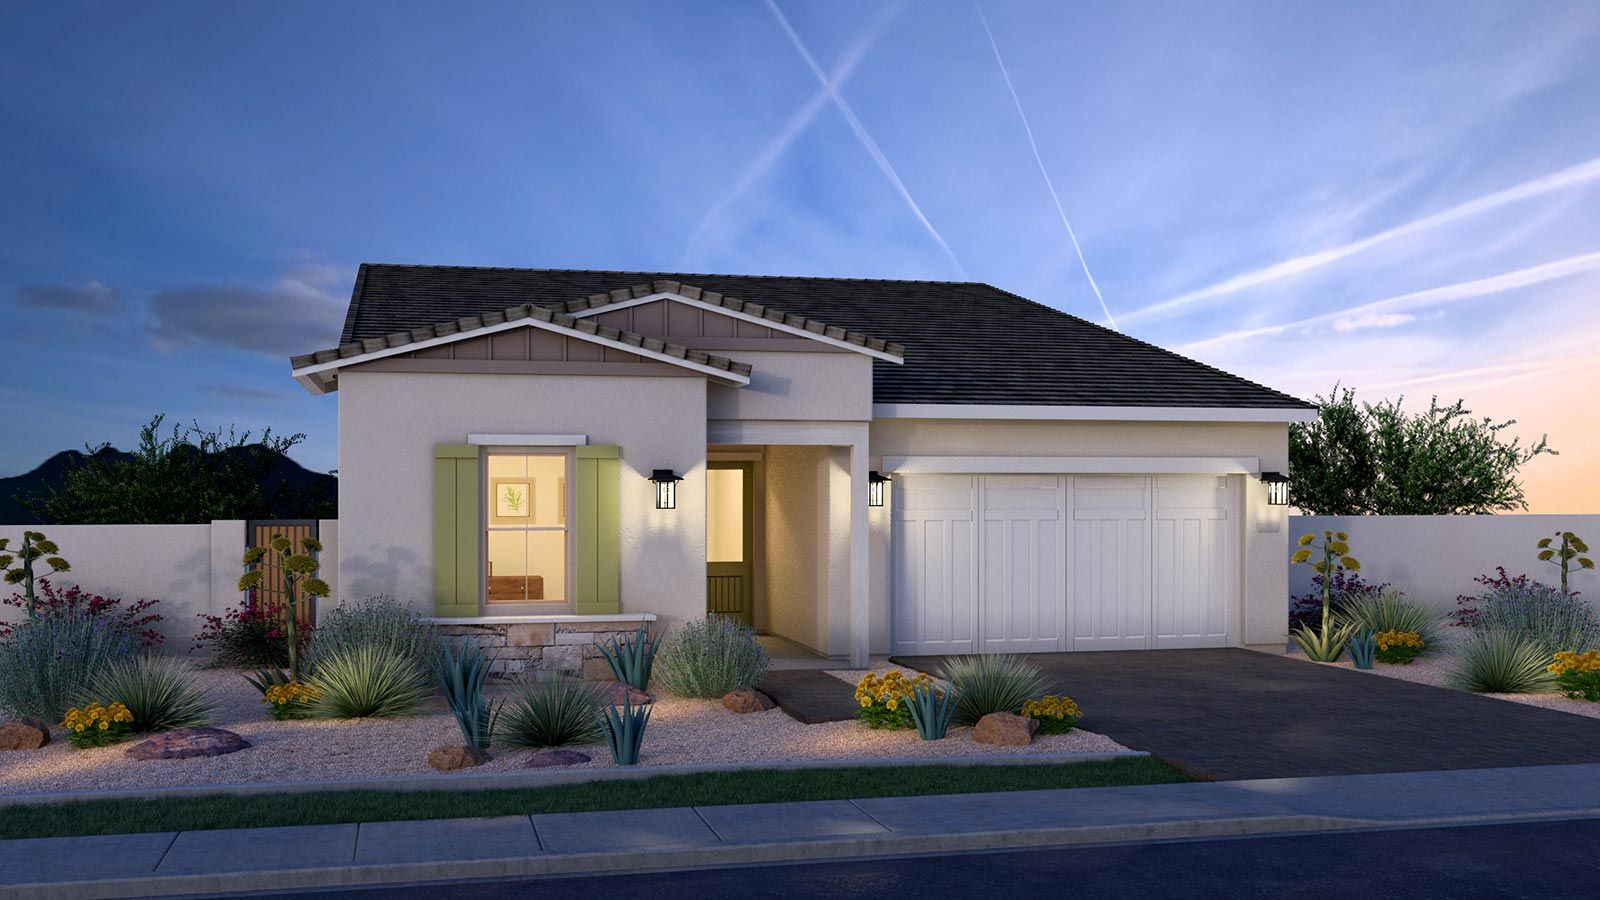 Exterior:Modern Ranch Elevation Rendering